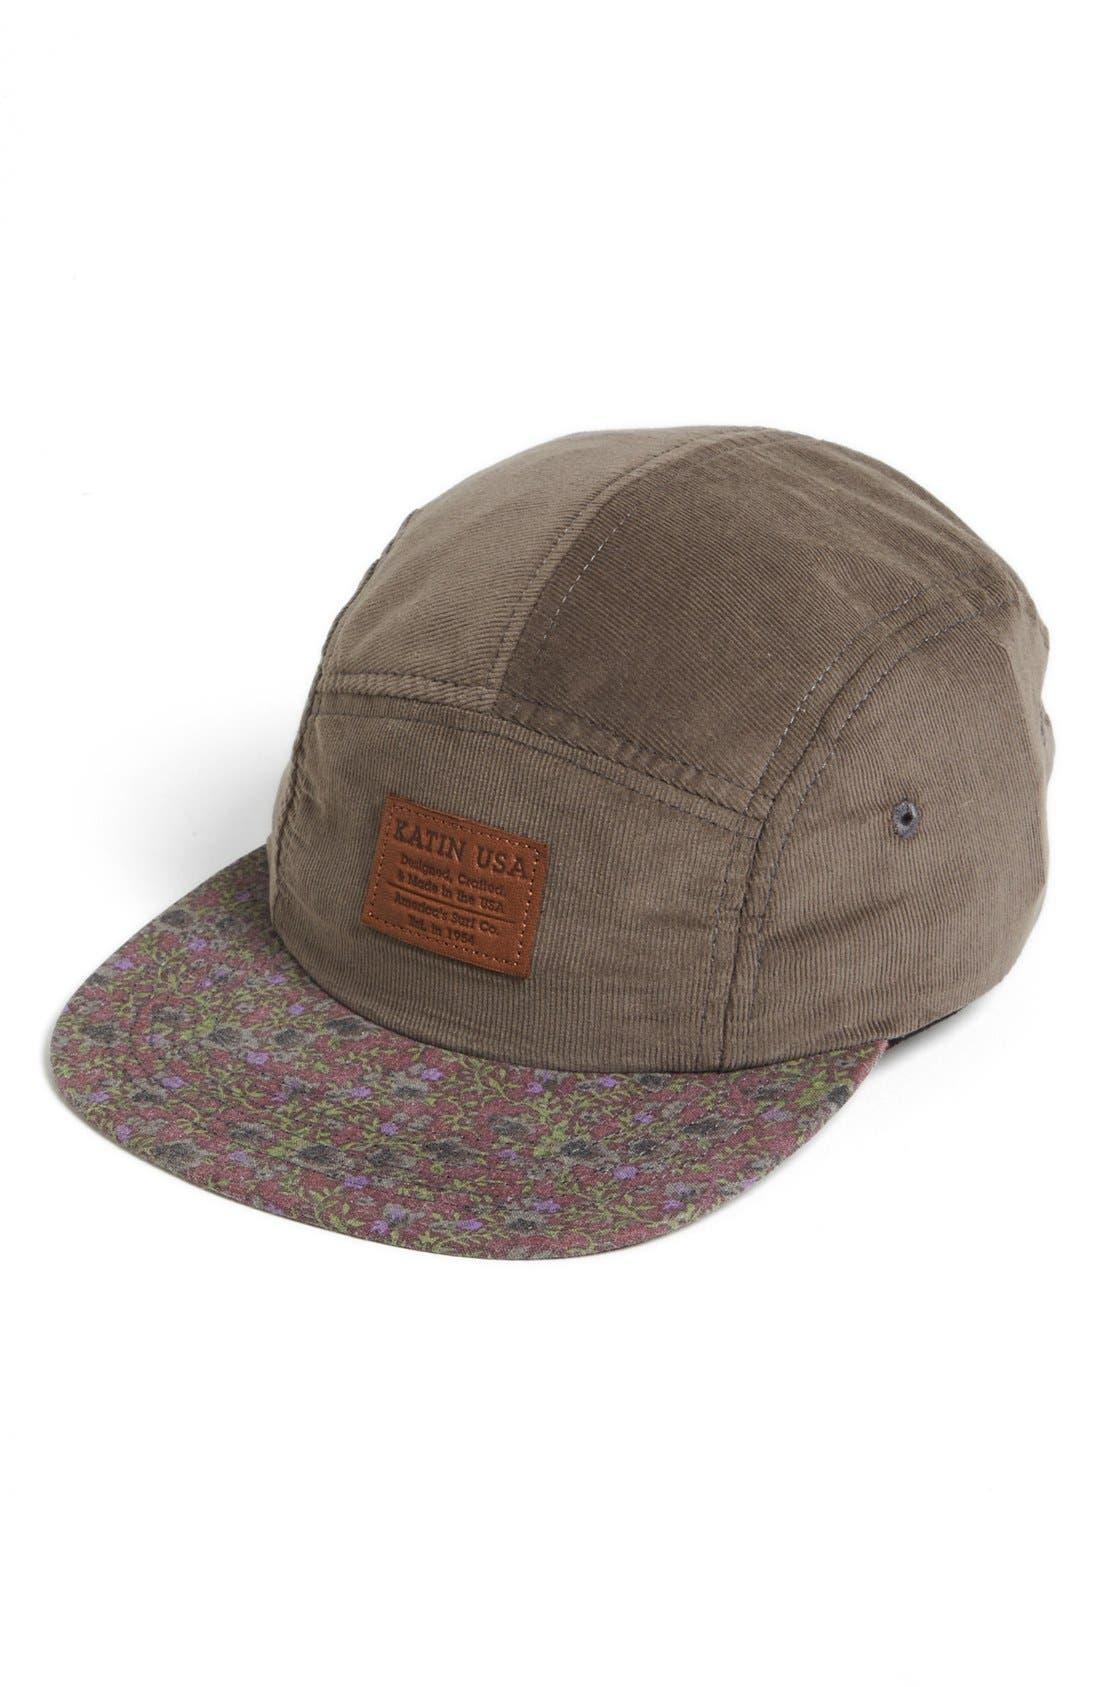 Alternate Image 1 Selected - Katin 'Garden' Cap